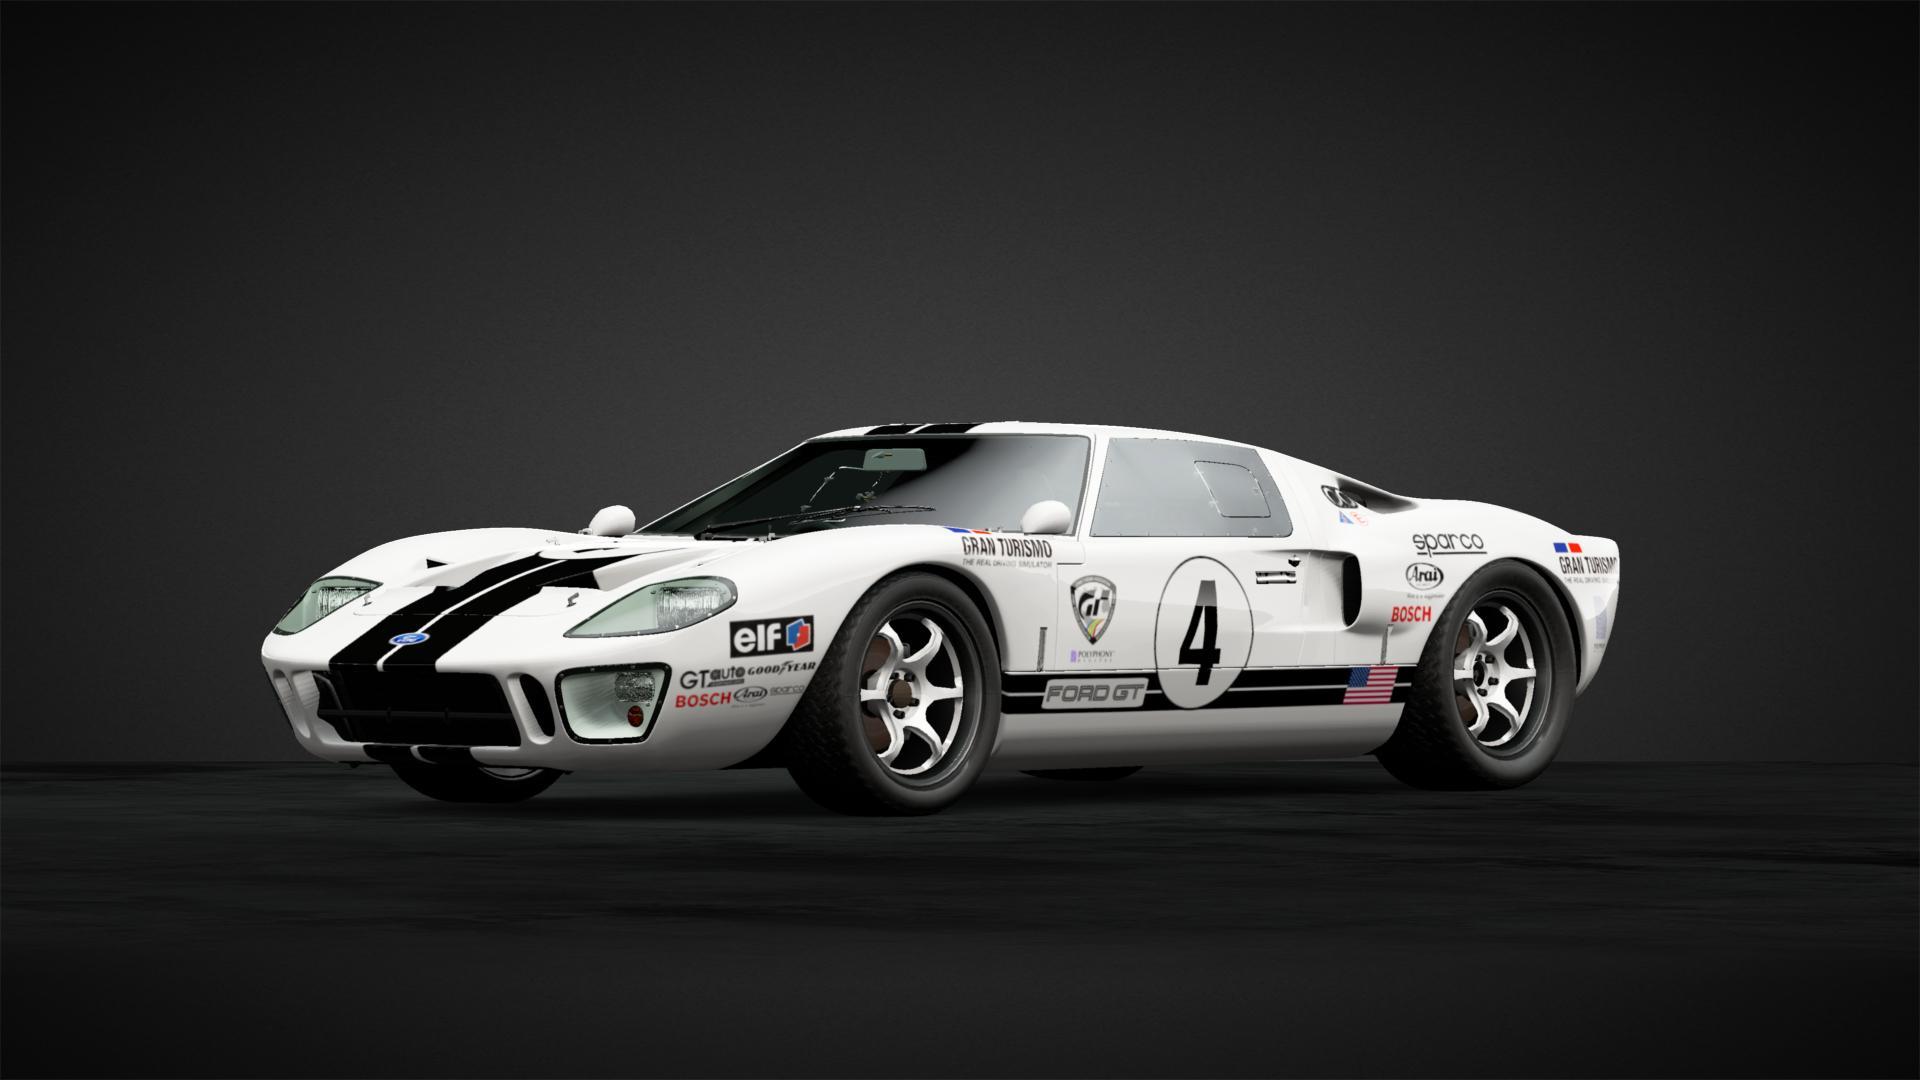 Ford Gt Lm Race Car Gt Car Livery By Gmastir Community Gran Turismo Sport